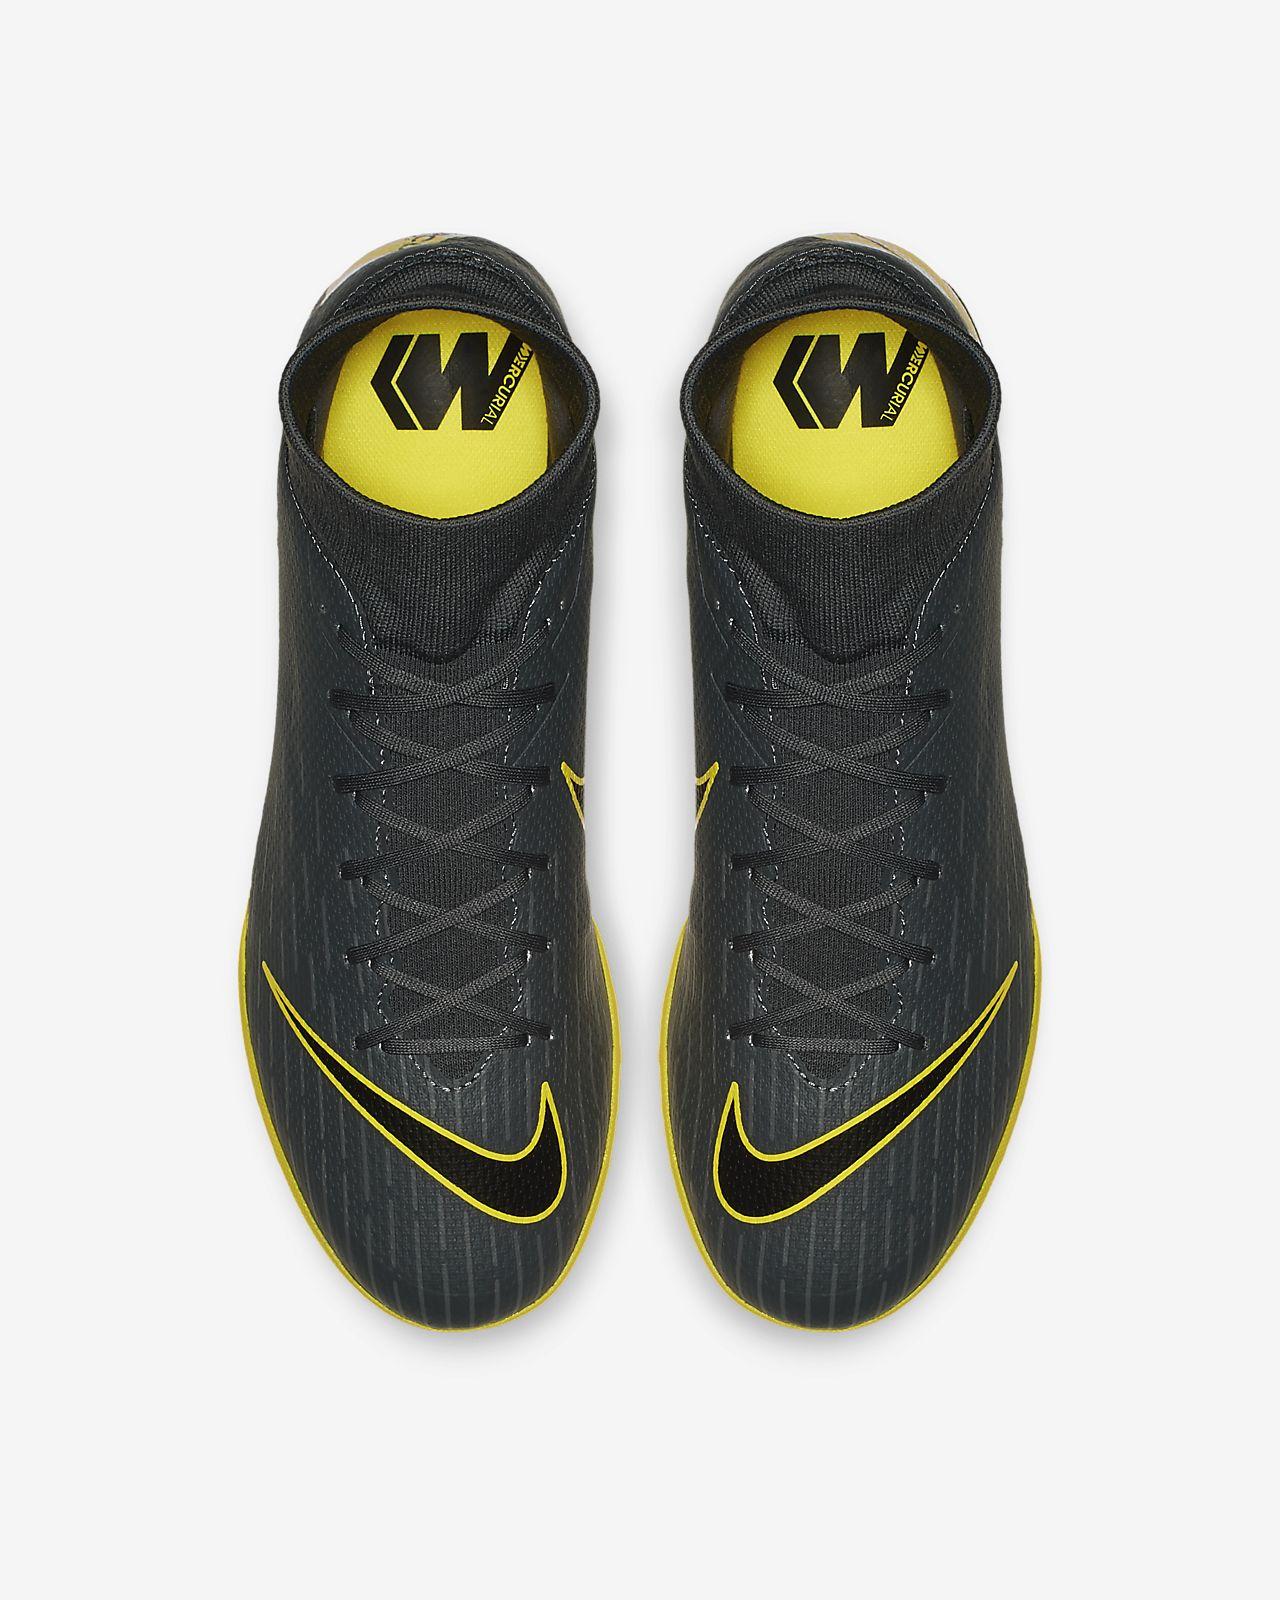 best website 5cc49 d8994 ... Chaussure de football à crampons pour surface synthétique Nike  SuperflyX 6 Academy TF